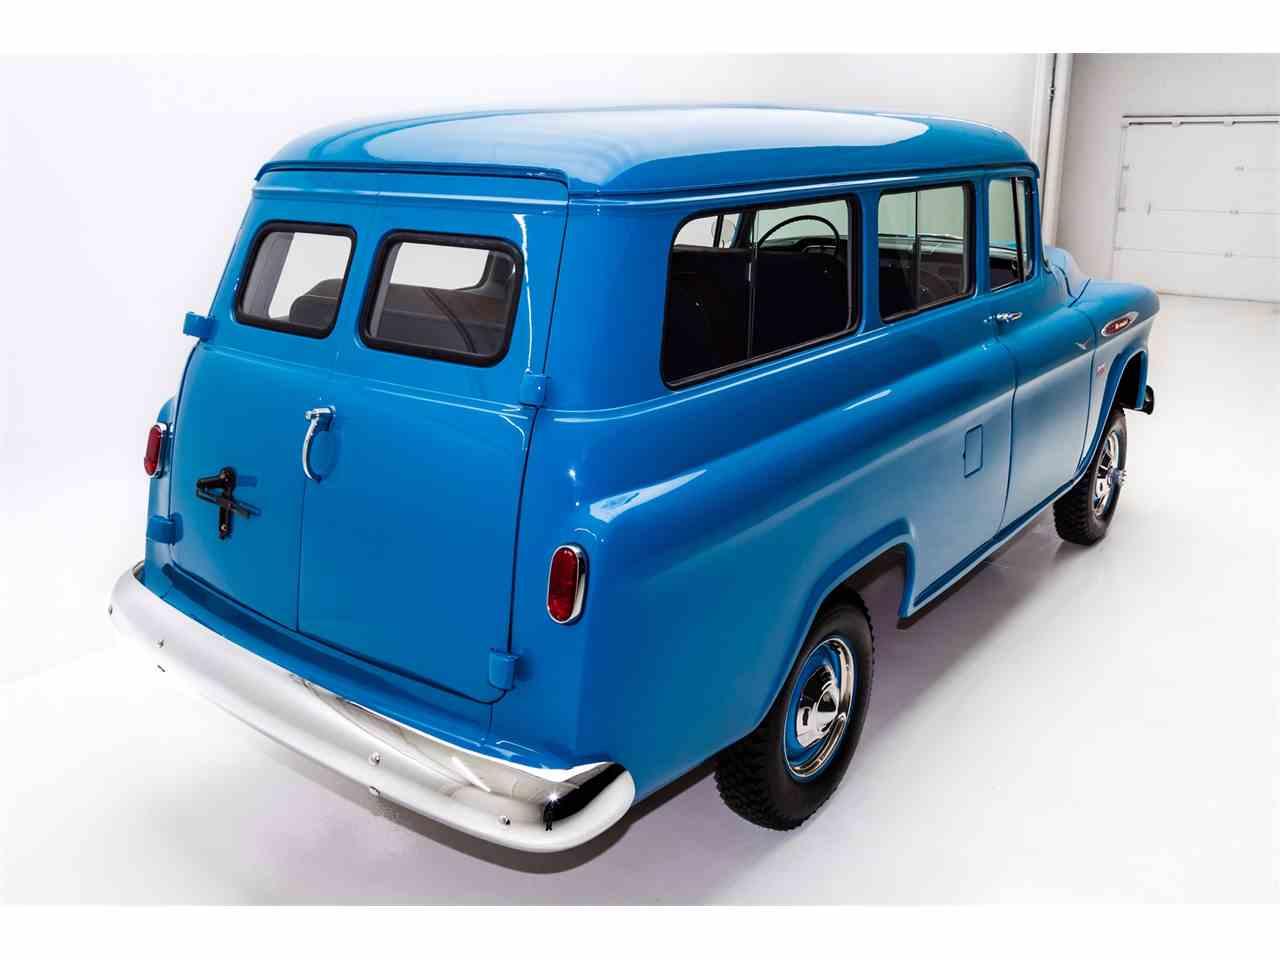 1957 chevrolet suburban for sale cc 944072. Black Bedroom Furniture Sets. Home Design Ideas